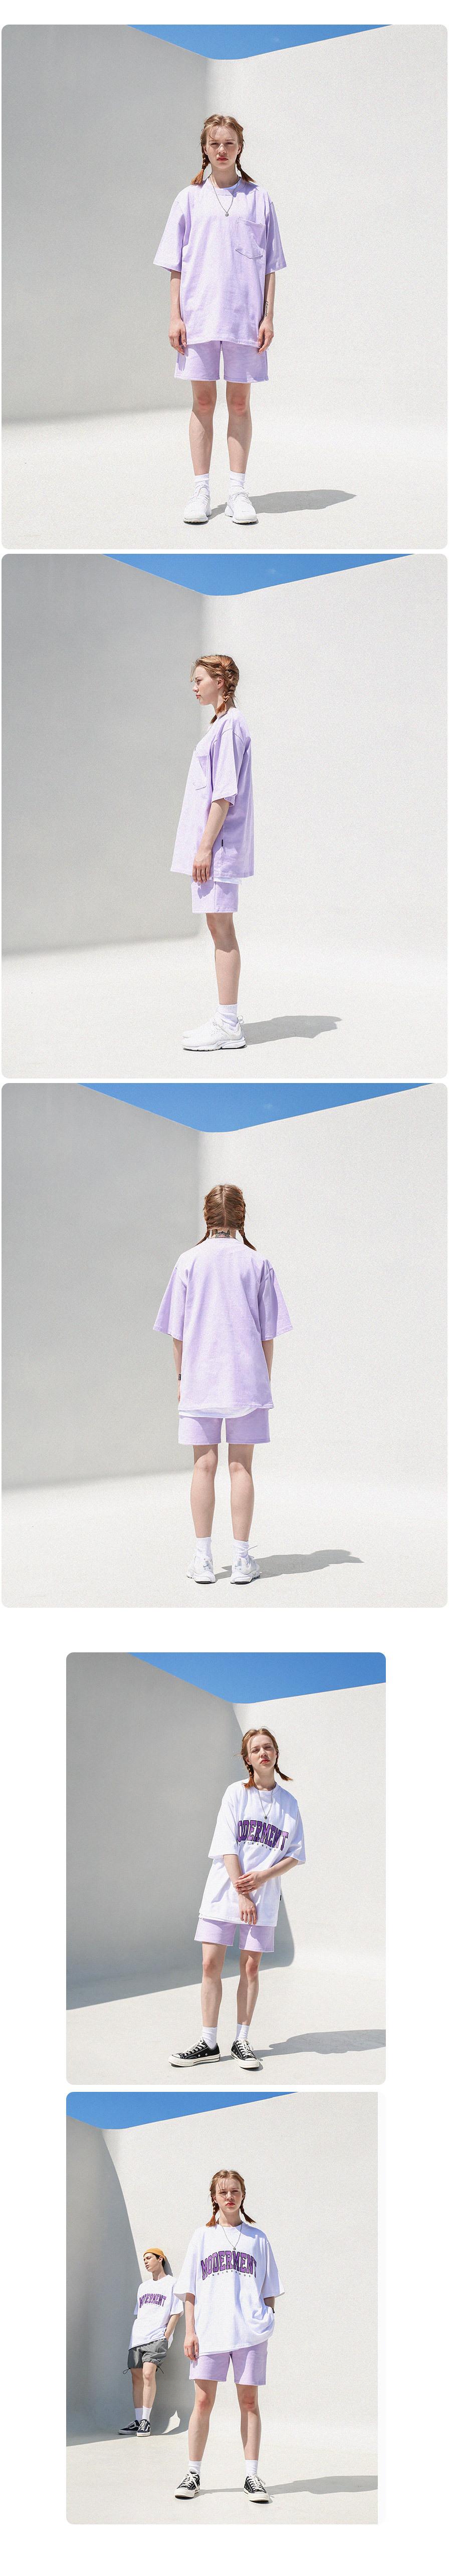 [UNISEX] 스웨트 쇼츠 반바지 (라이트퍼플)